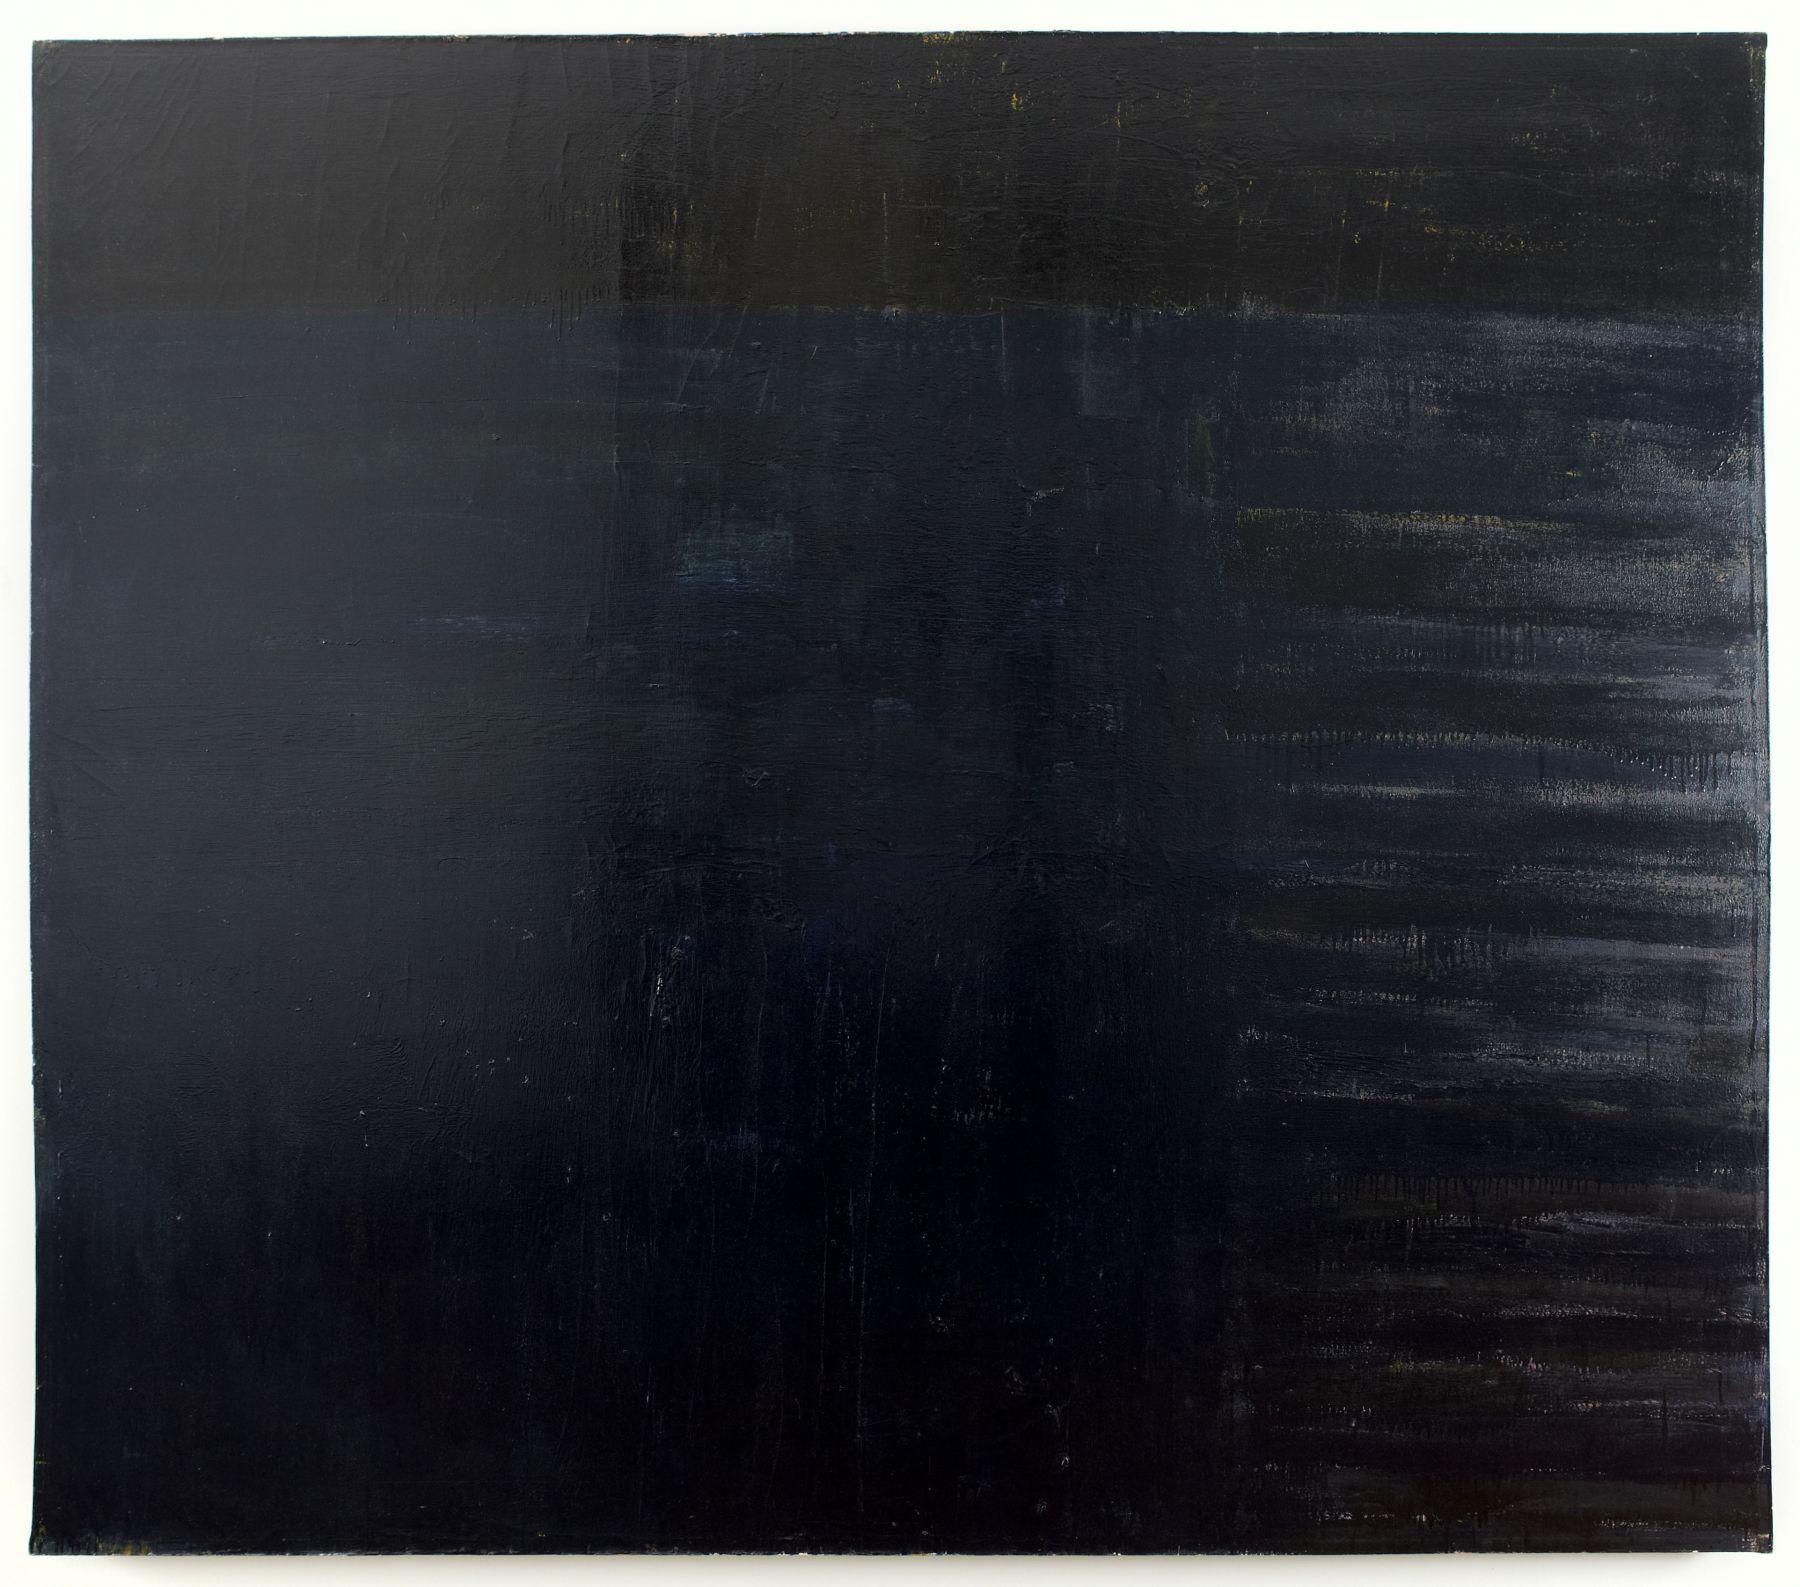 black painting by frank stella